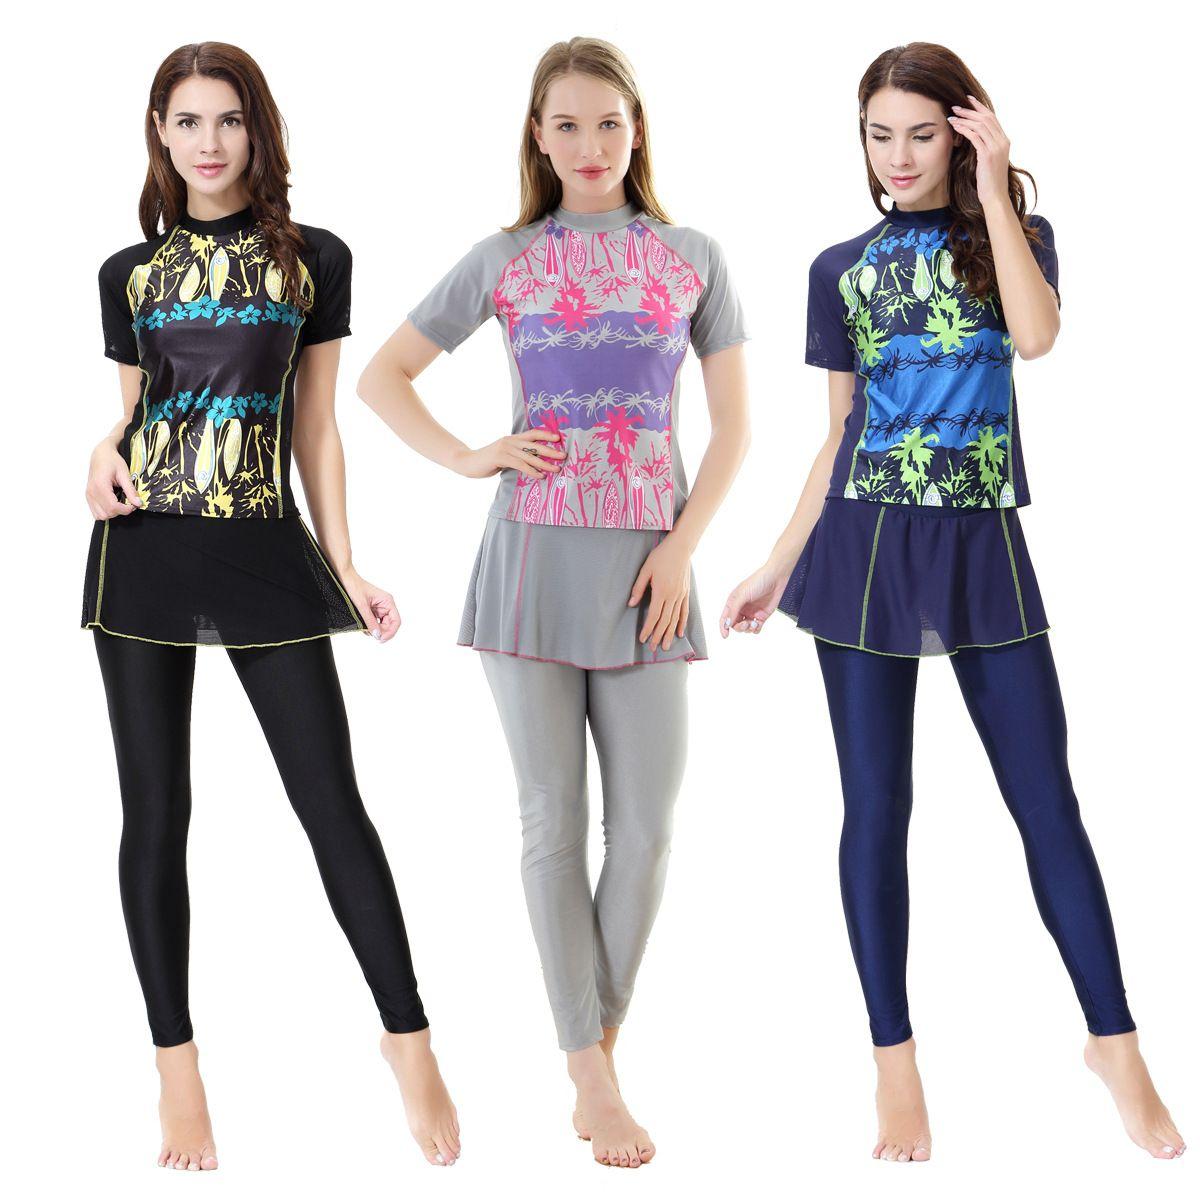 3fa6d56e01f 2019 Women S Muslim Swimwear Short Sleeve Skirt Printed Female Bathing Suit  Burkinis Two Piece Modest Swimsuit Women Lady Girl XX 390 From Alan706337